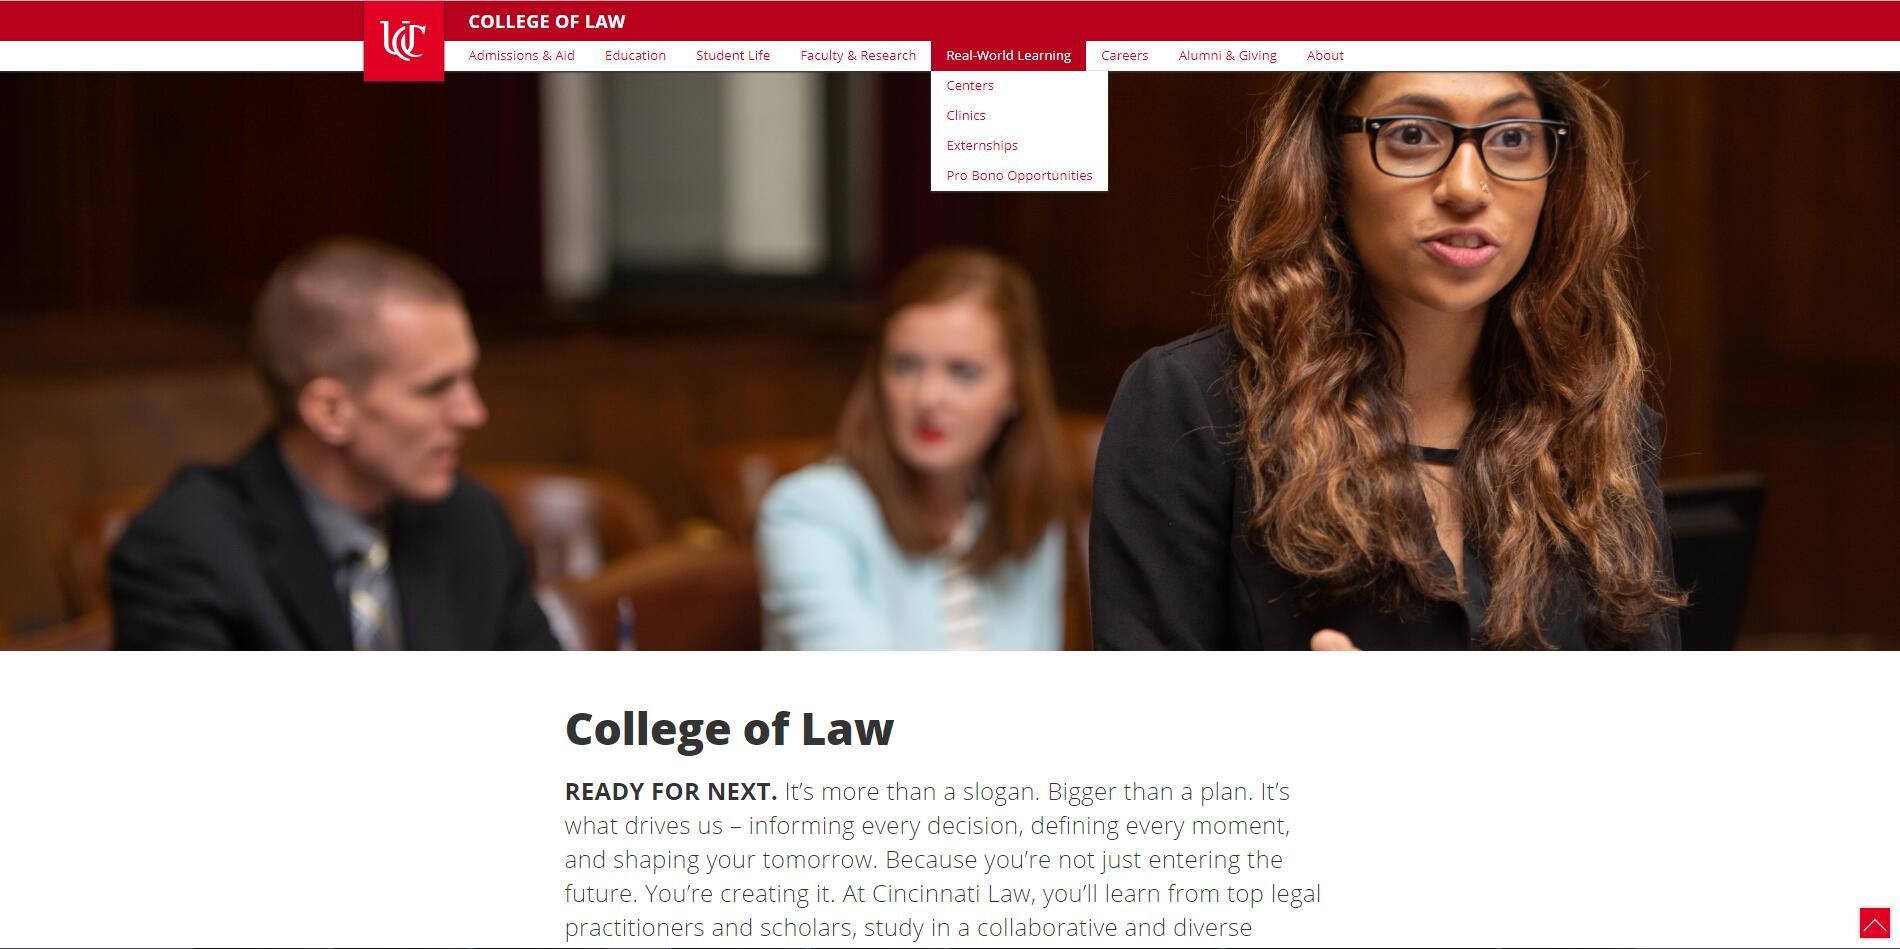 The College of Law at University of Cincinnati